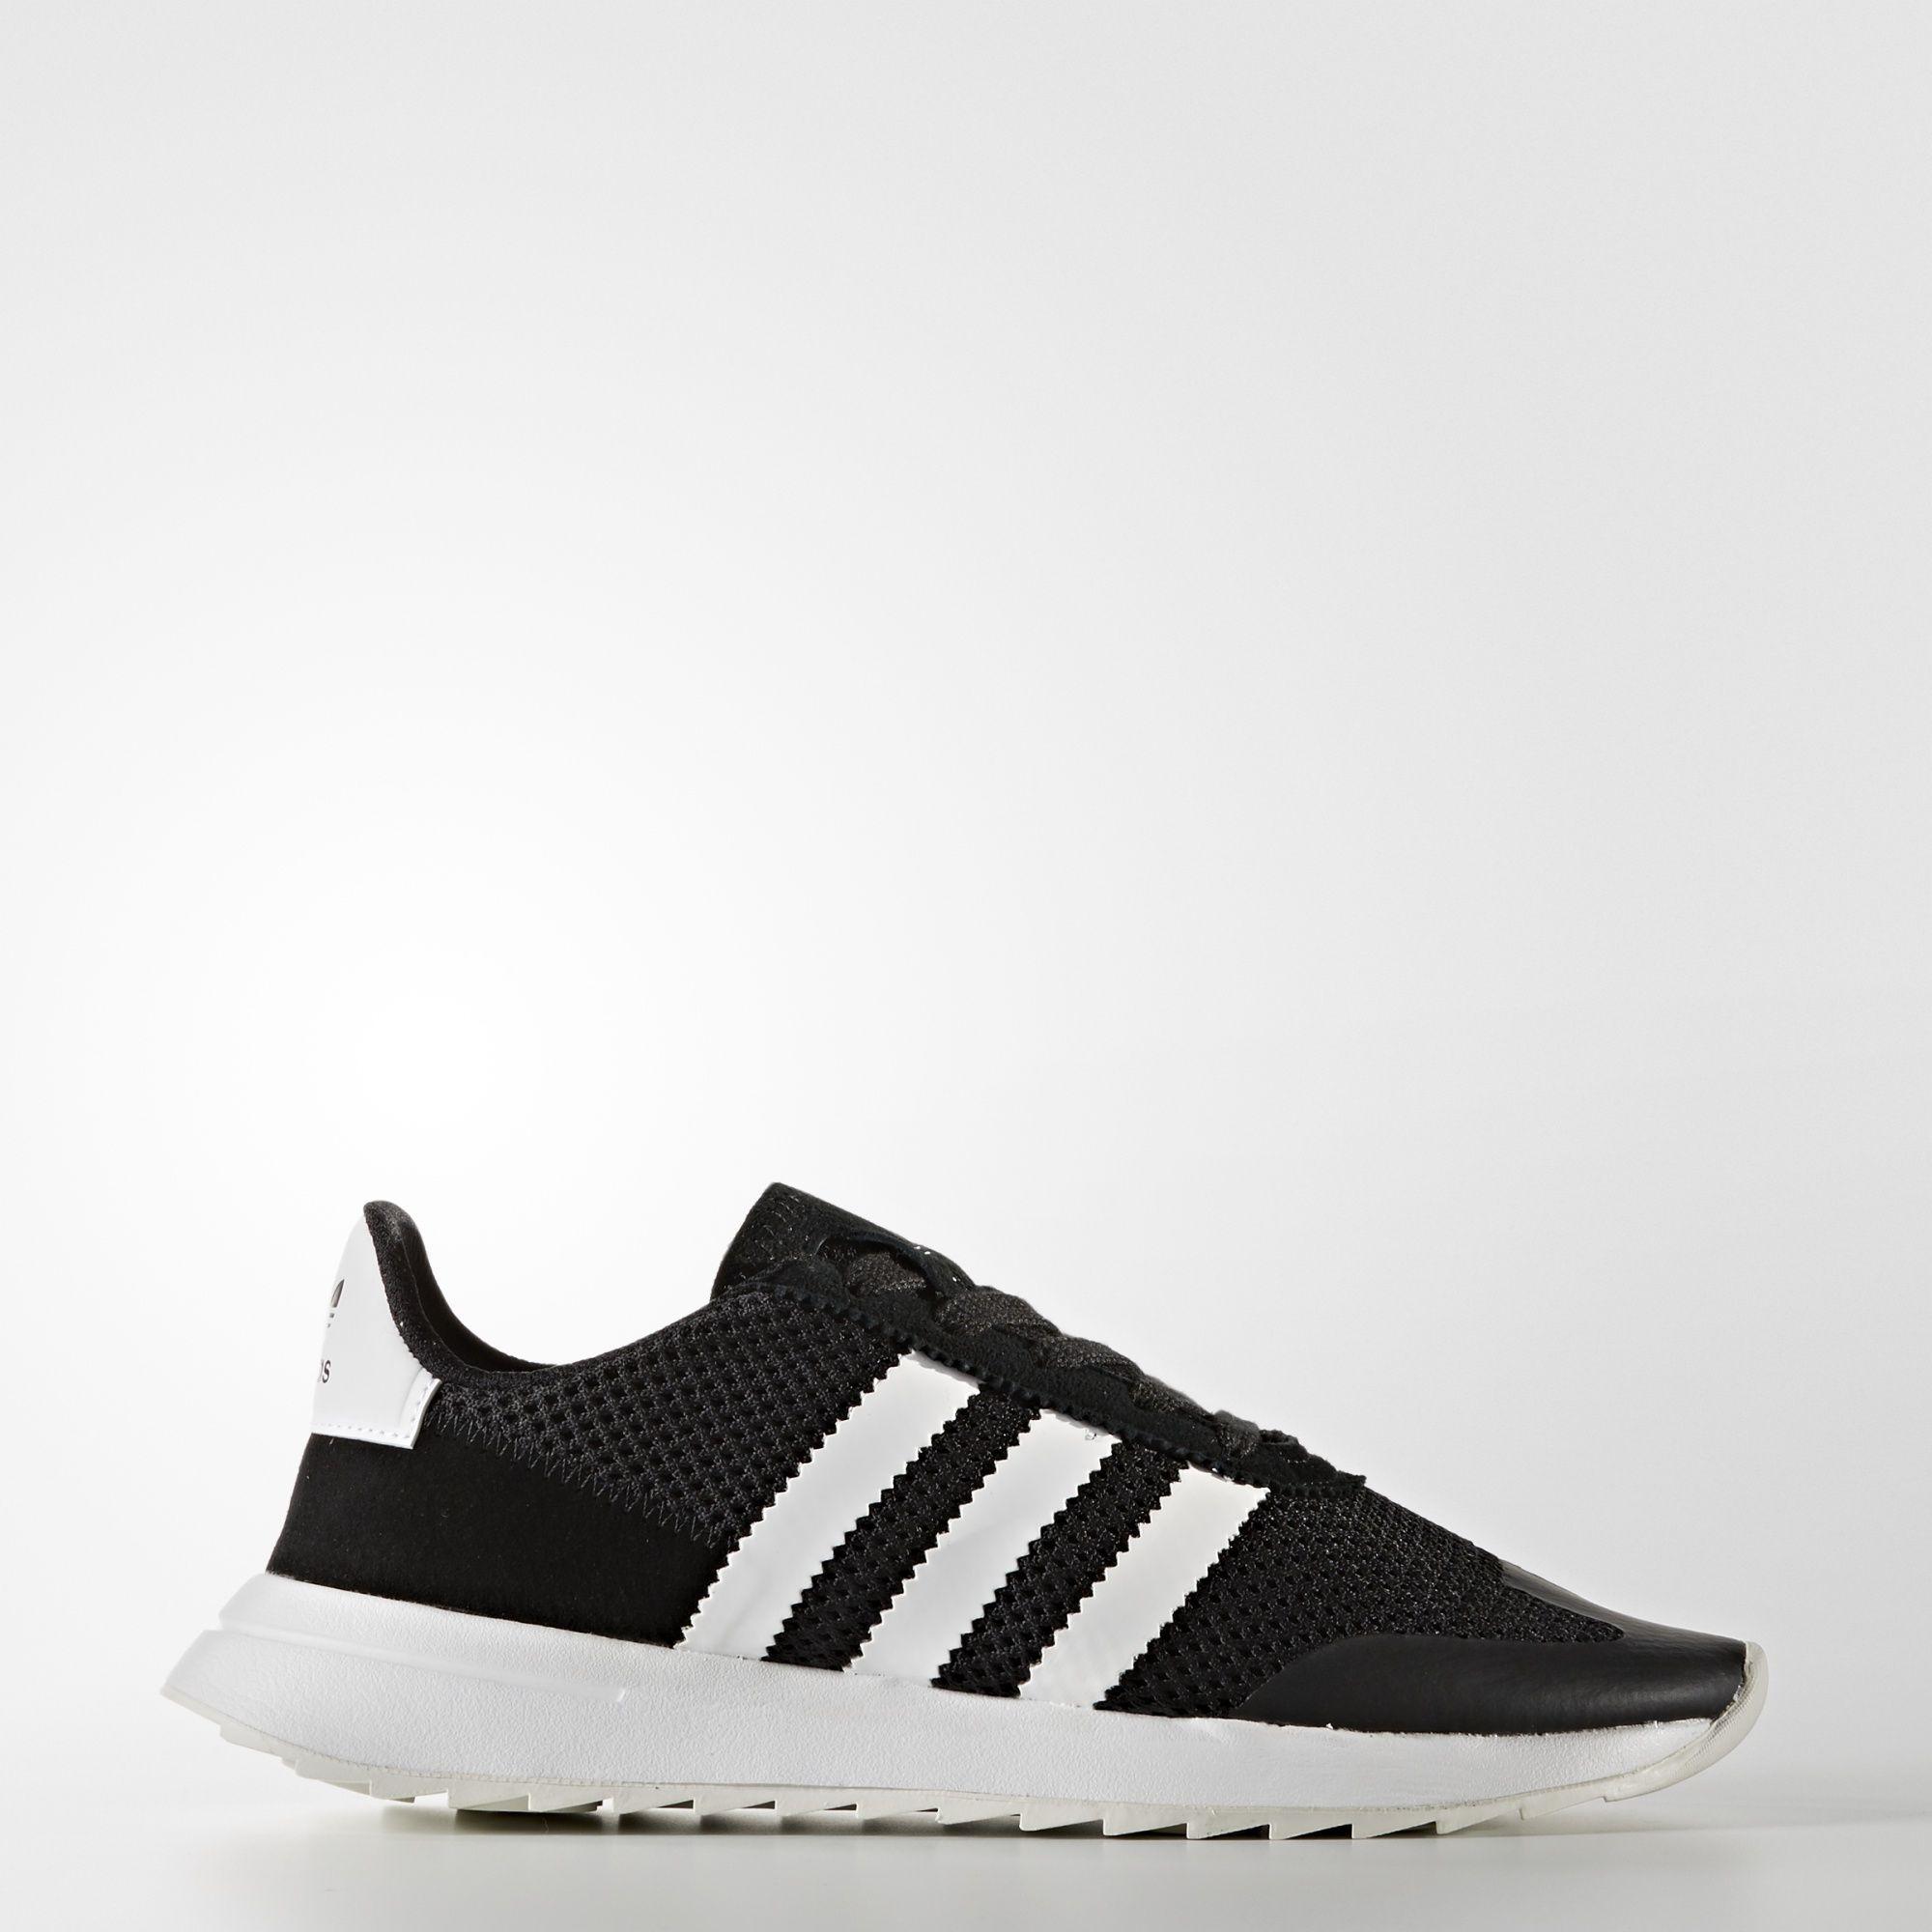 adidas - Flashrunner Shoes